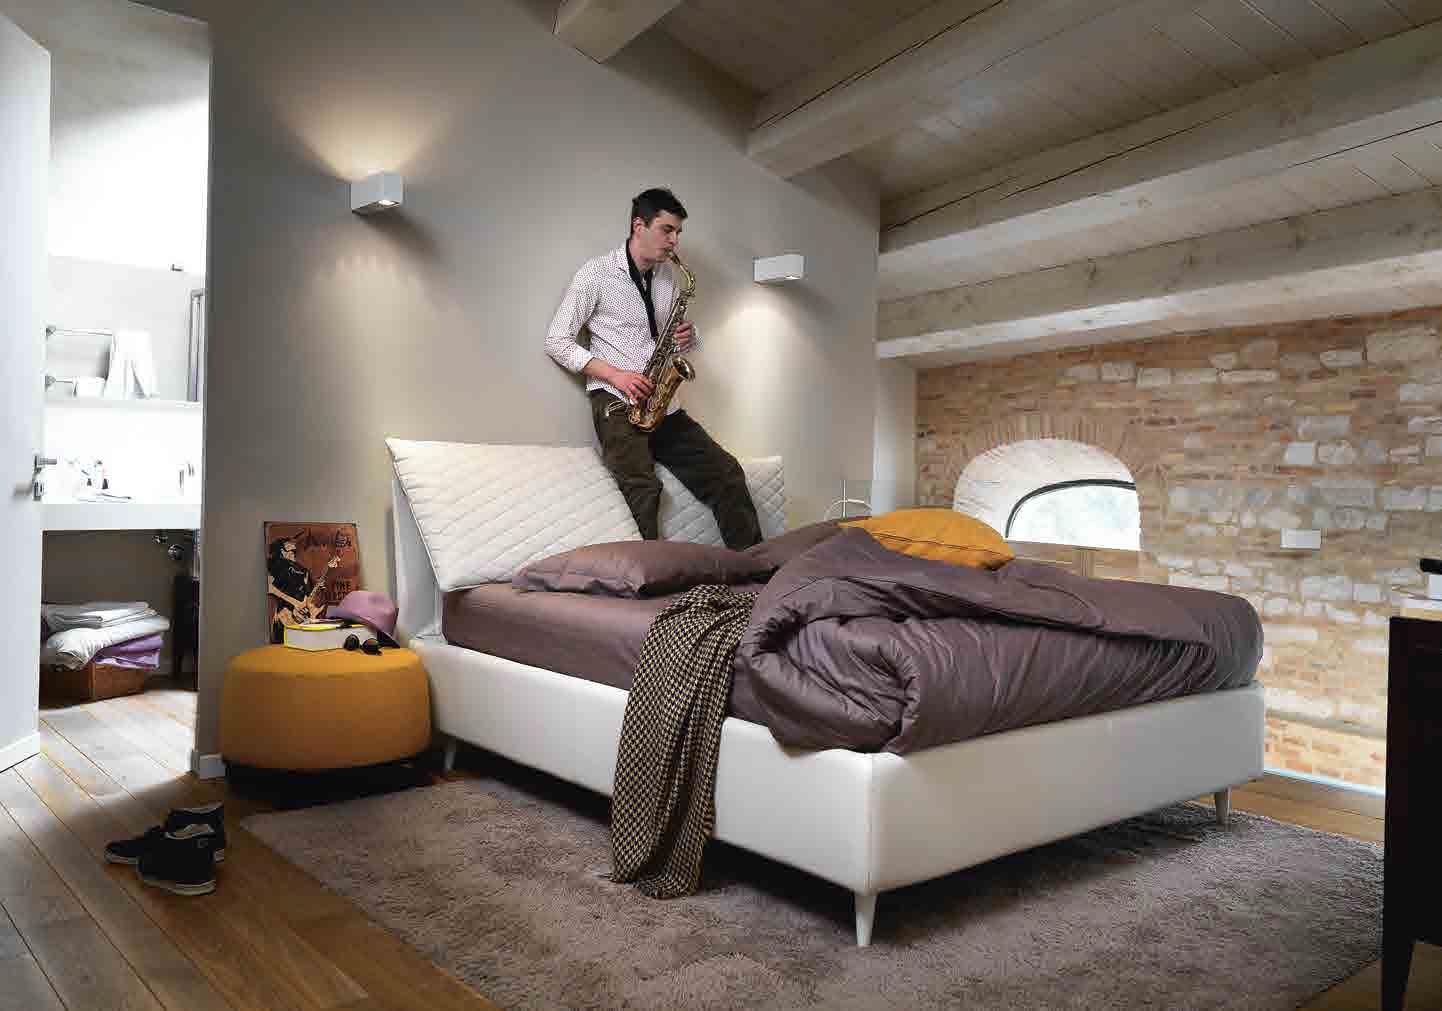 cabeceros-tapizados-general-muebles-paco-caballero-1811-5cdfdfbe2bdf2